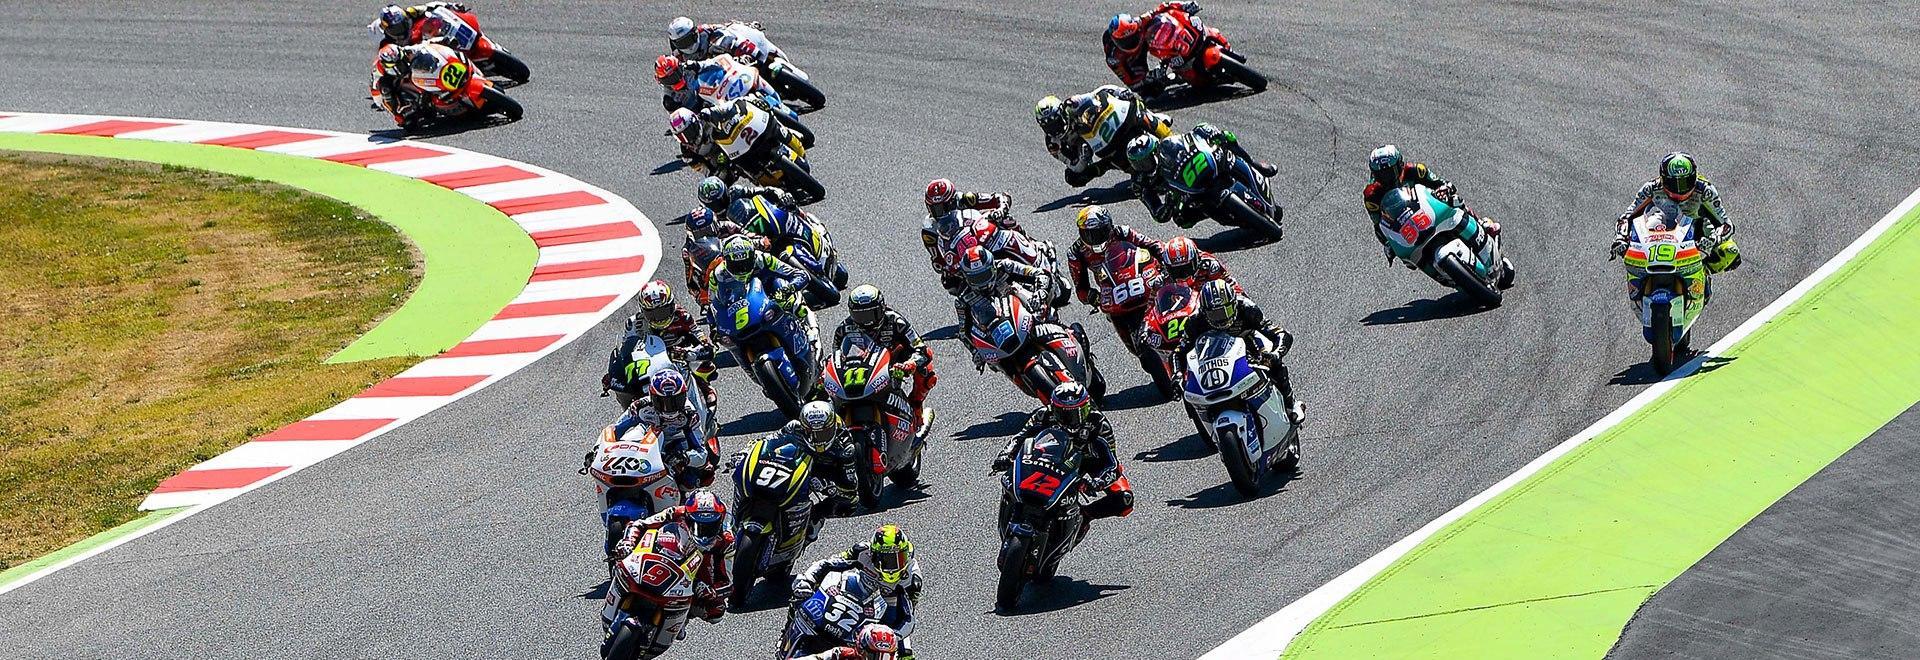 GP Valencia: Moto2. Race